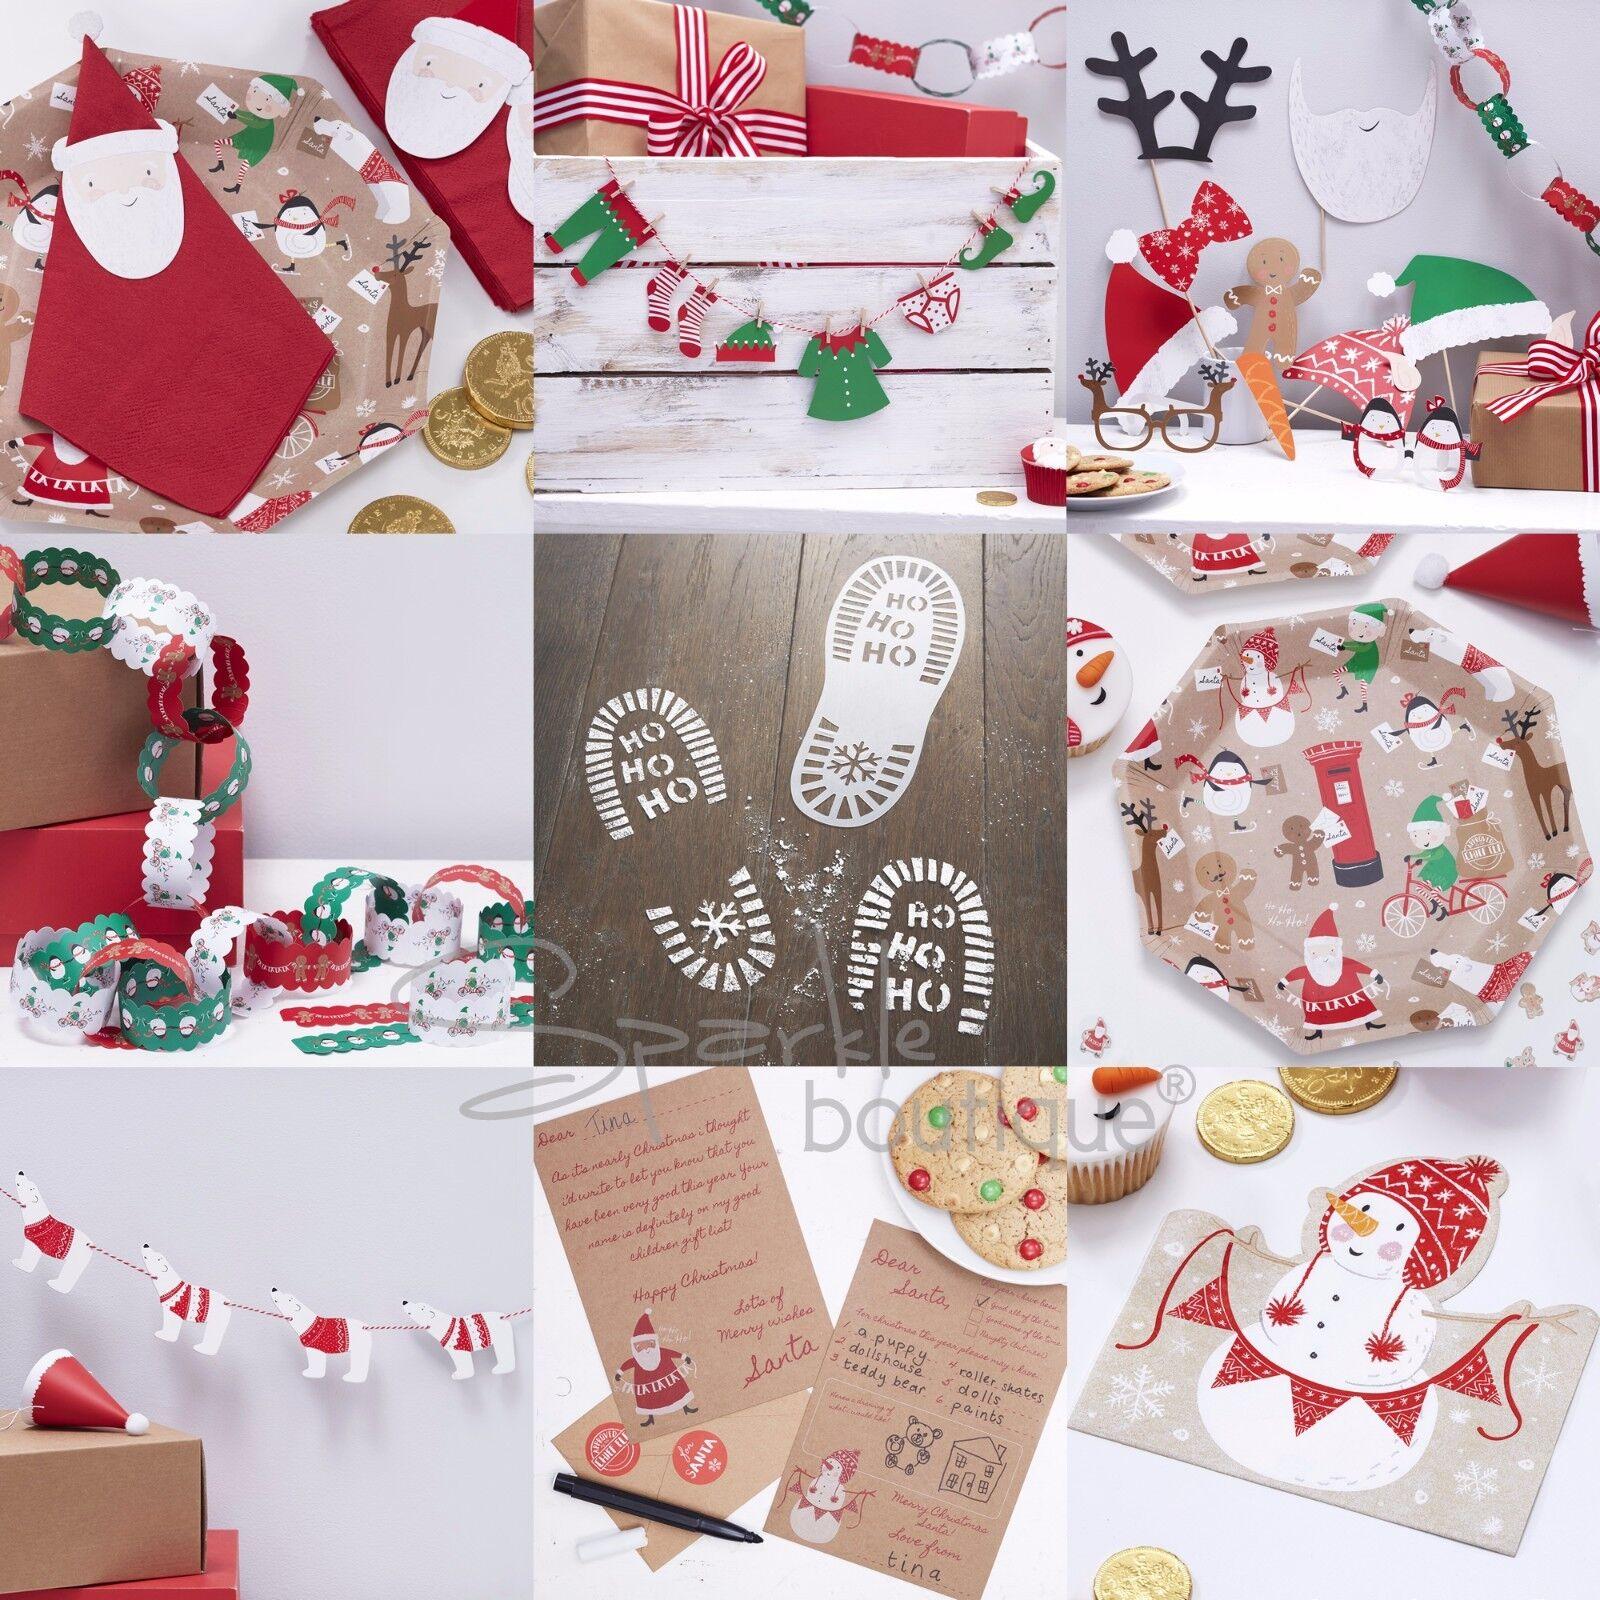 63aea9da1eab Ginger Ray Christmas Family Photo Booth Props Kit - Santa and ...